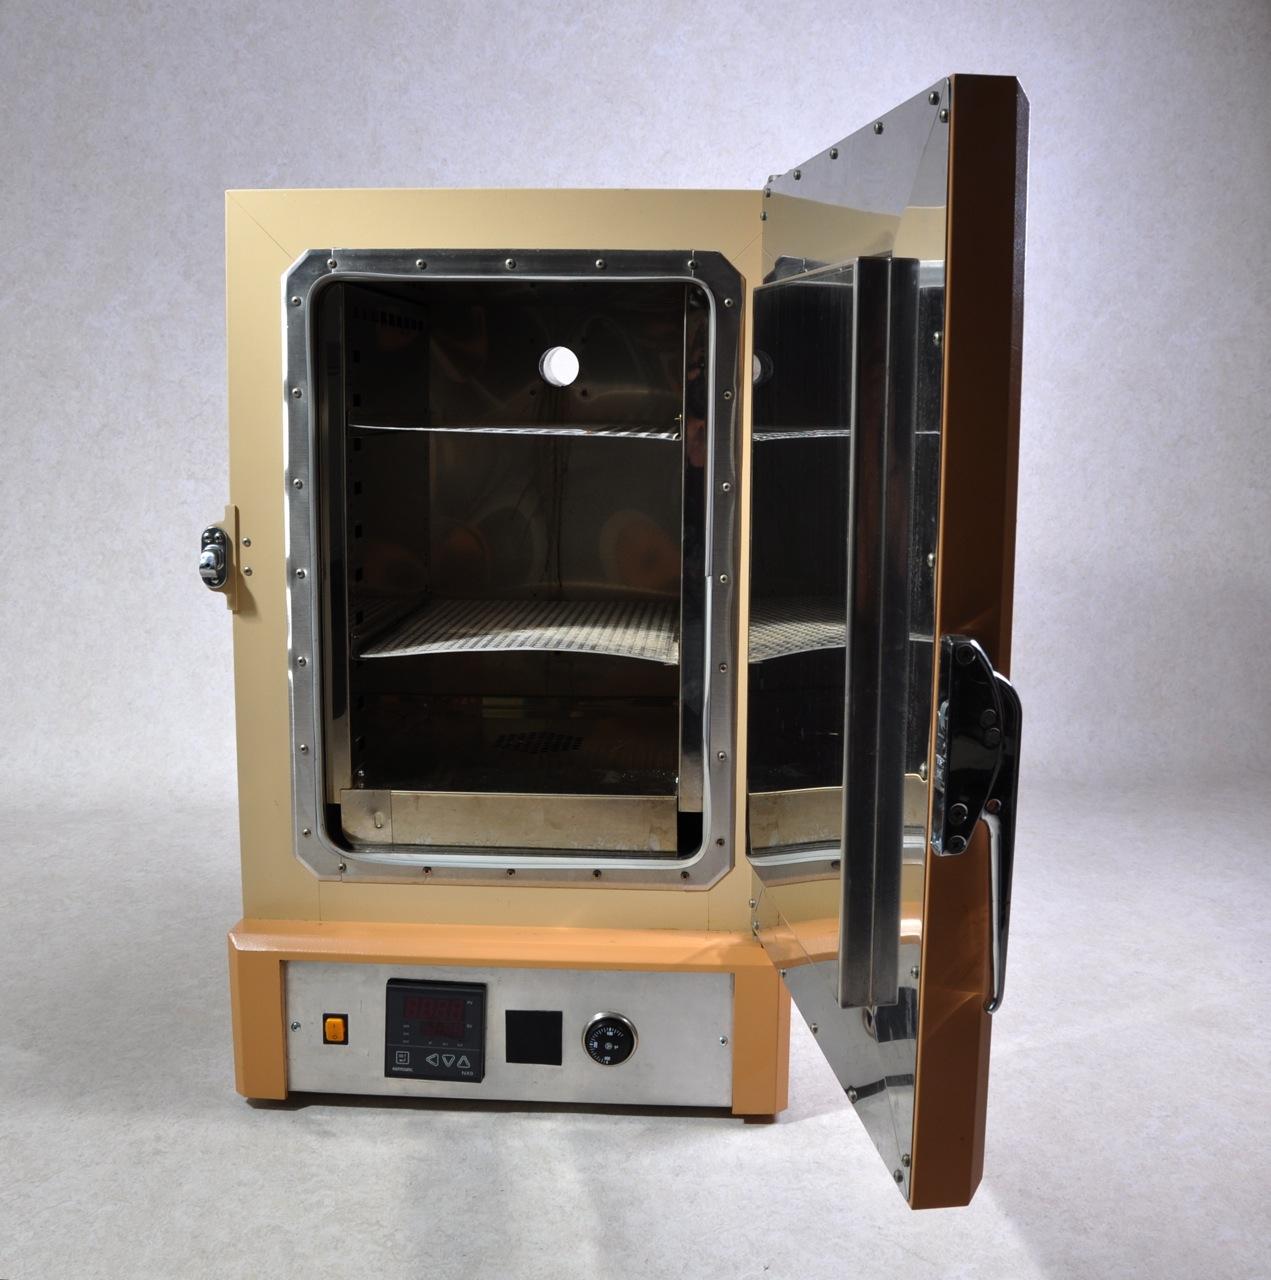 Lab-Line oven model 3490M-1 - Gemini BV